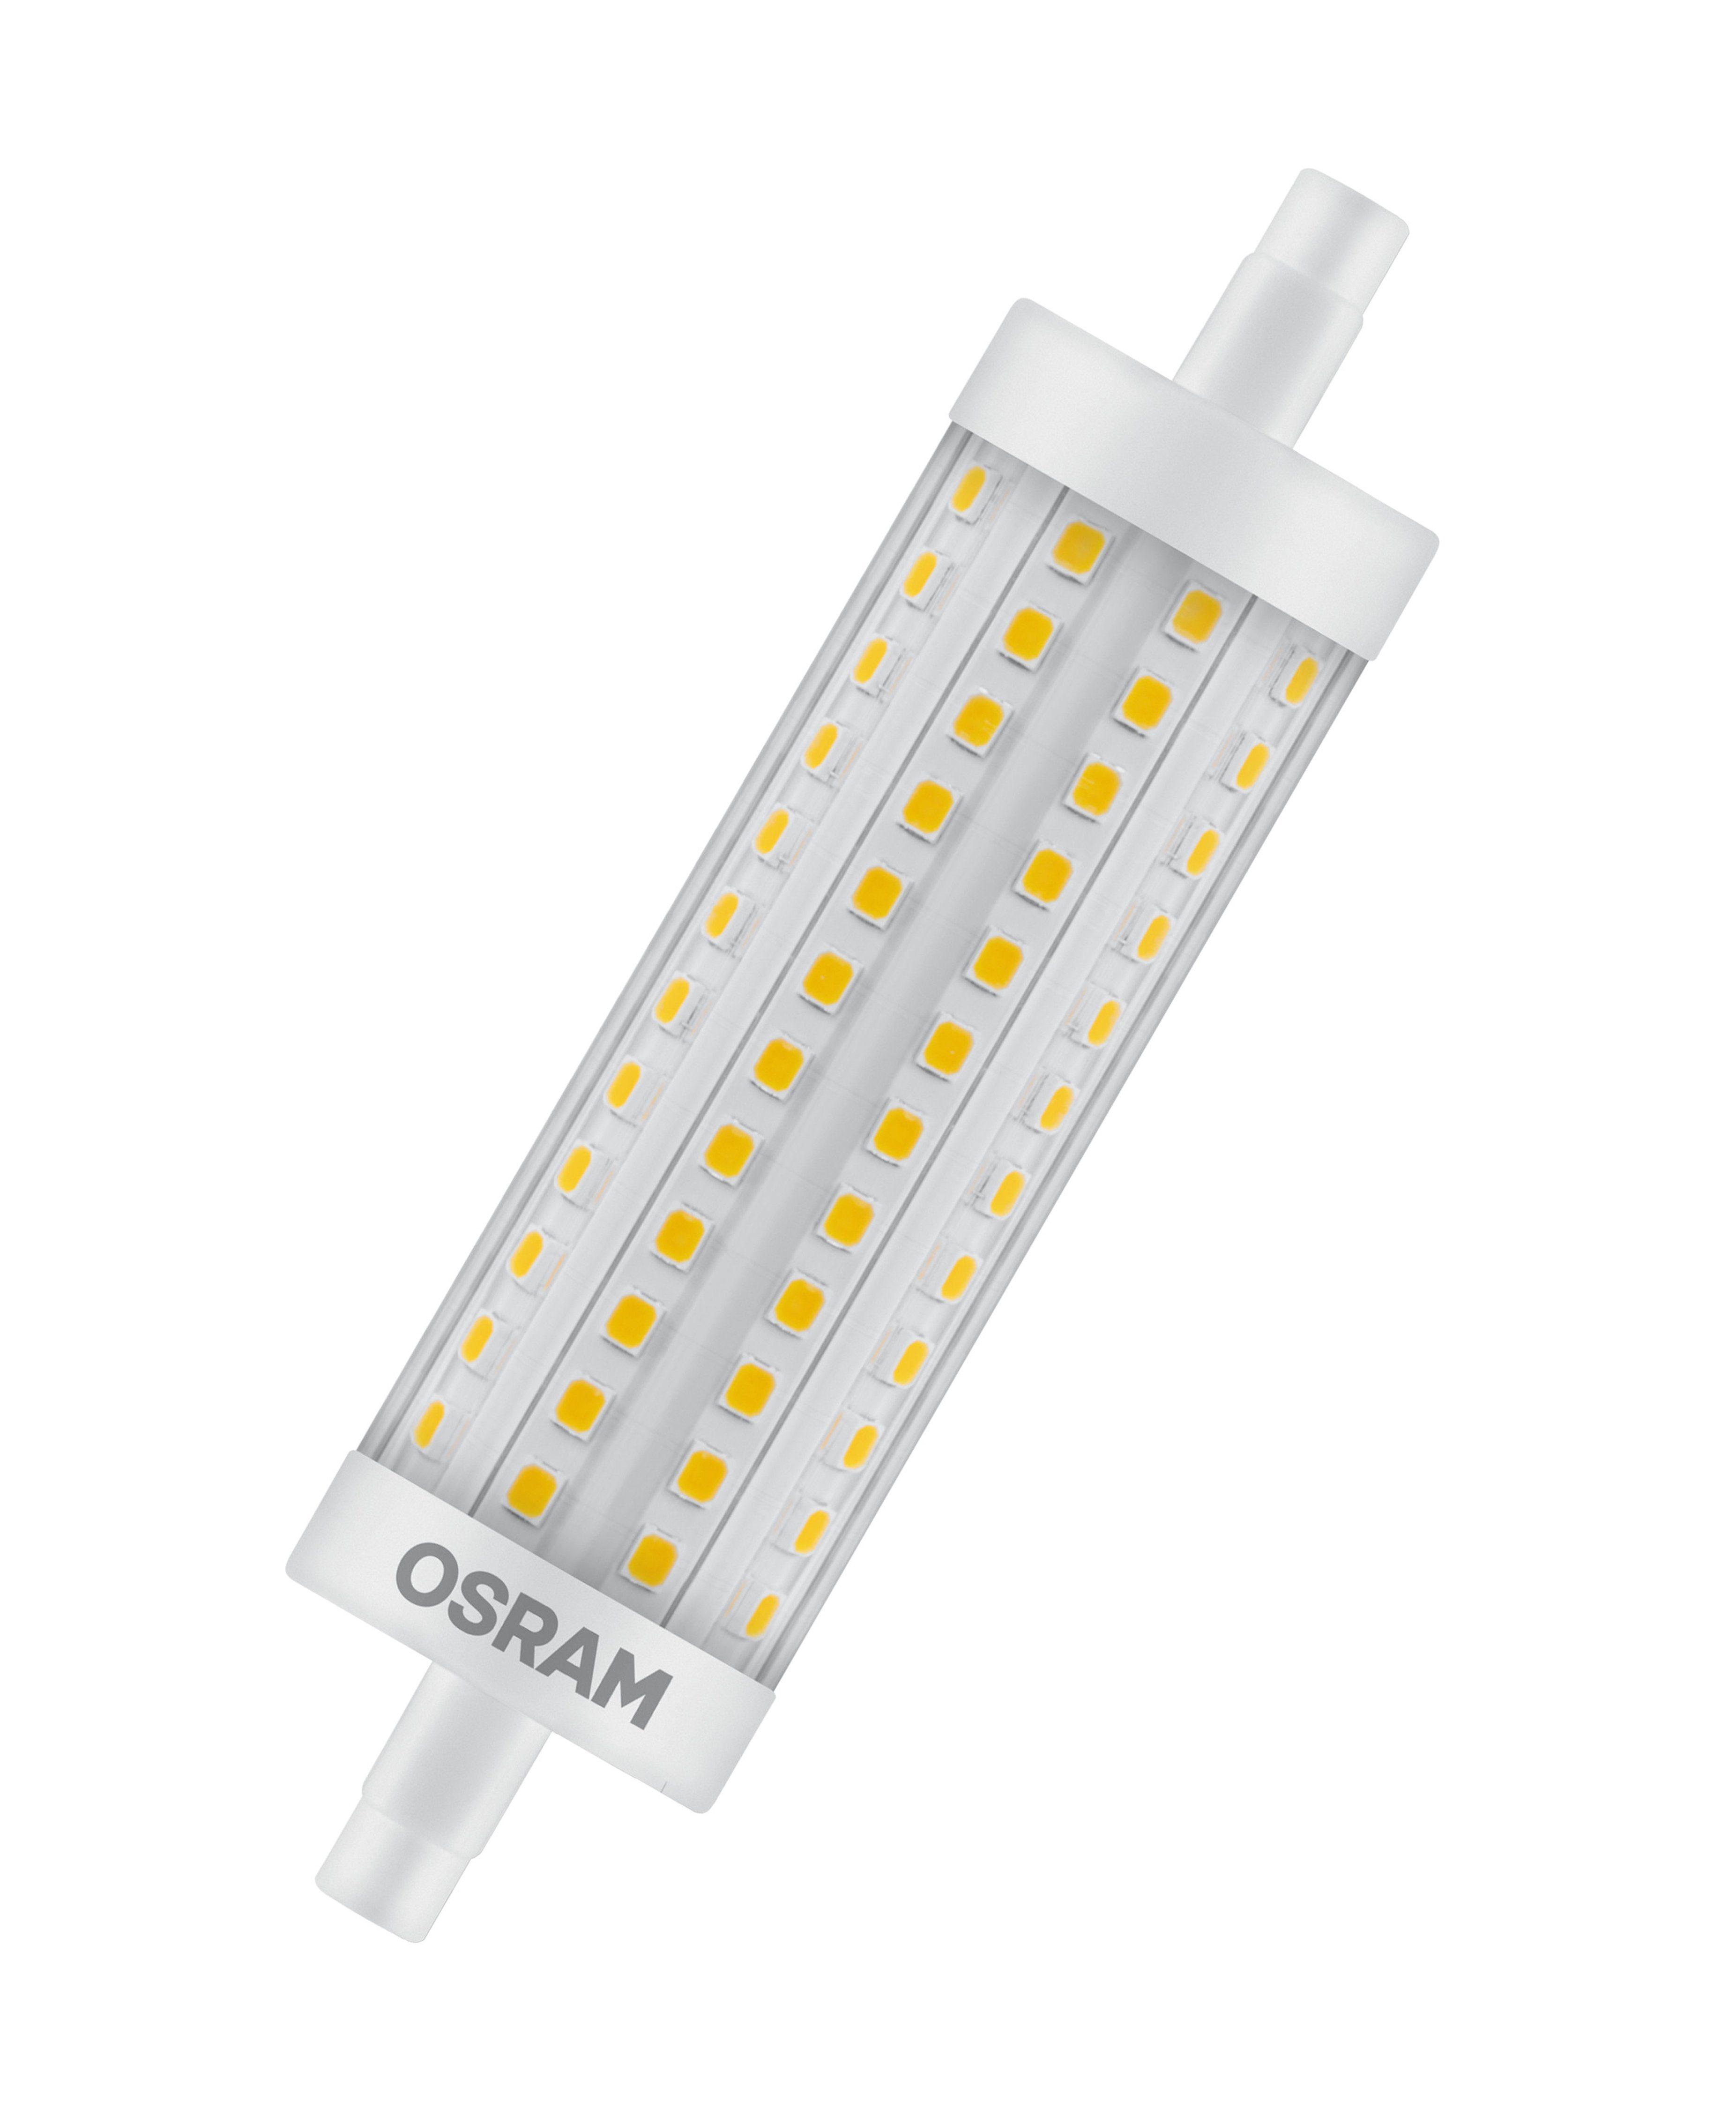 Osram LED STAR LINE R7s, LED-Lampe, LED-Stab »ST LINE R7s 118.0 mm 125 15 W/827 R7s«